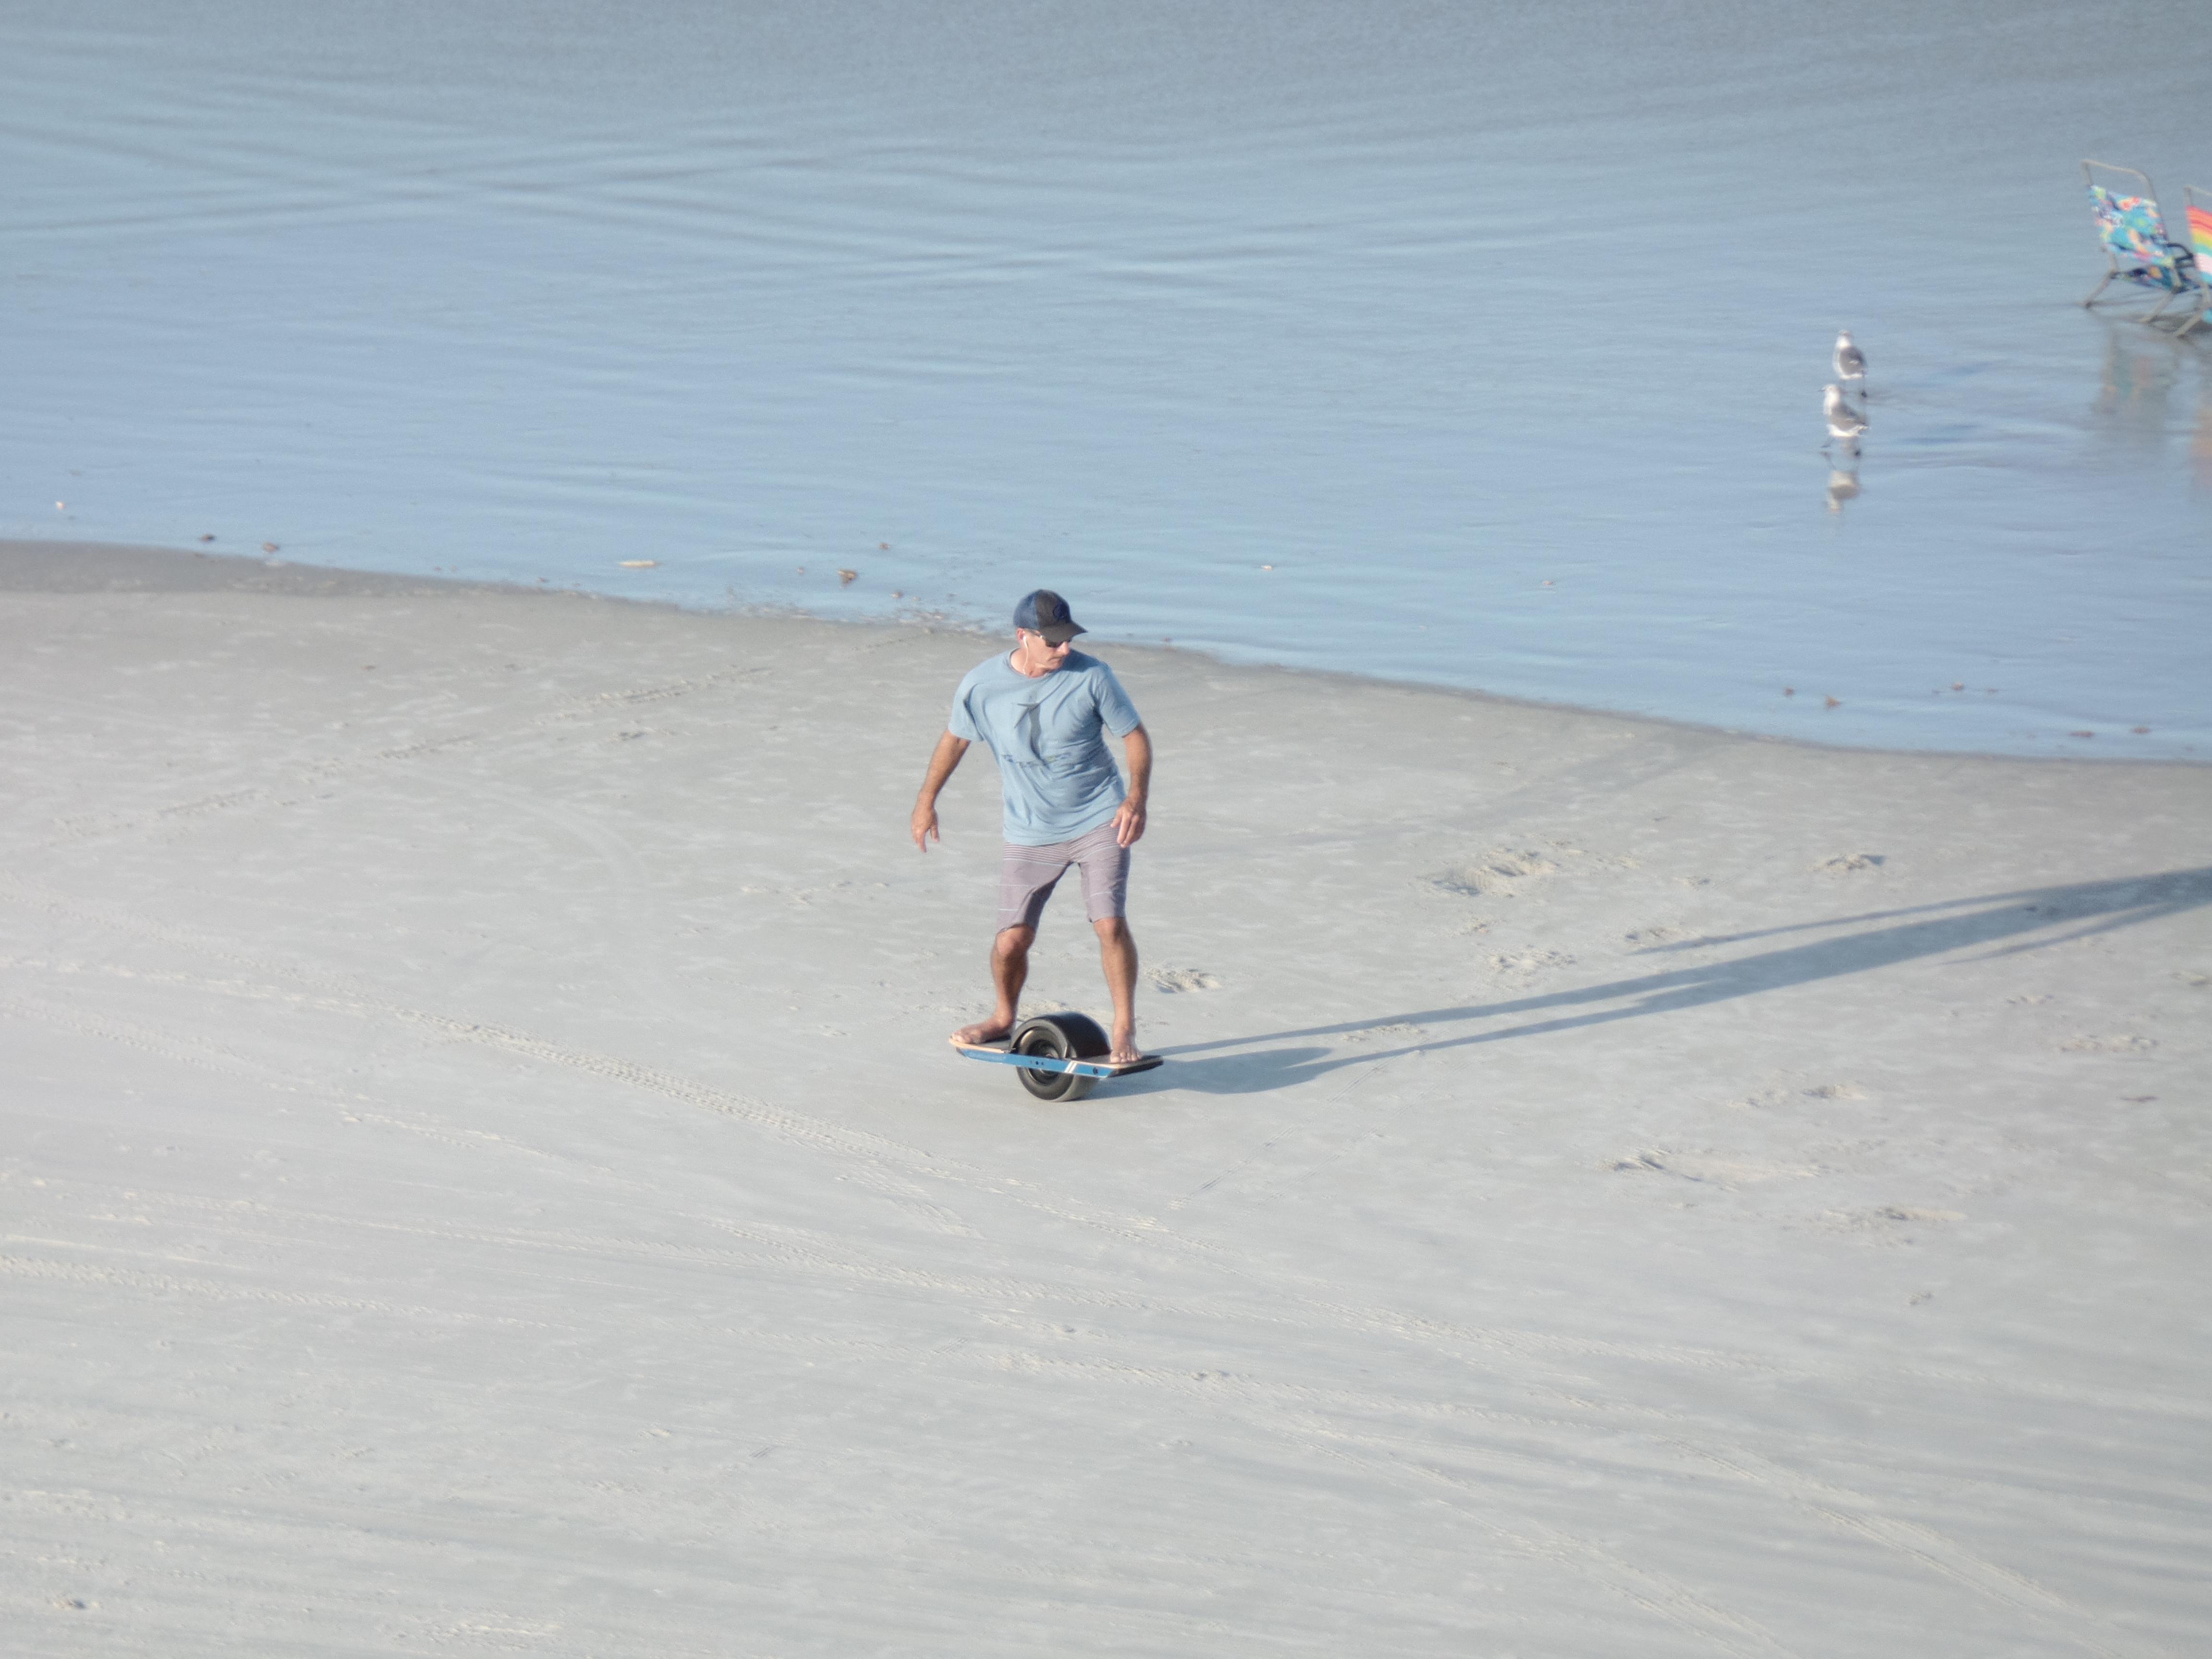 join the summer beach fun at New Smyrna Beach on a one-wheel